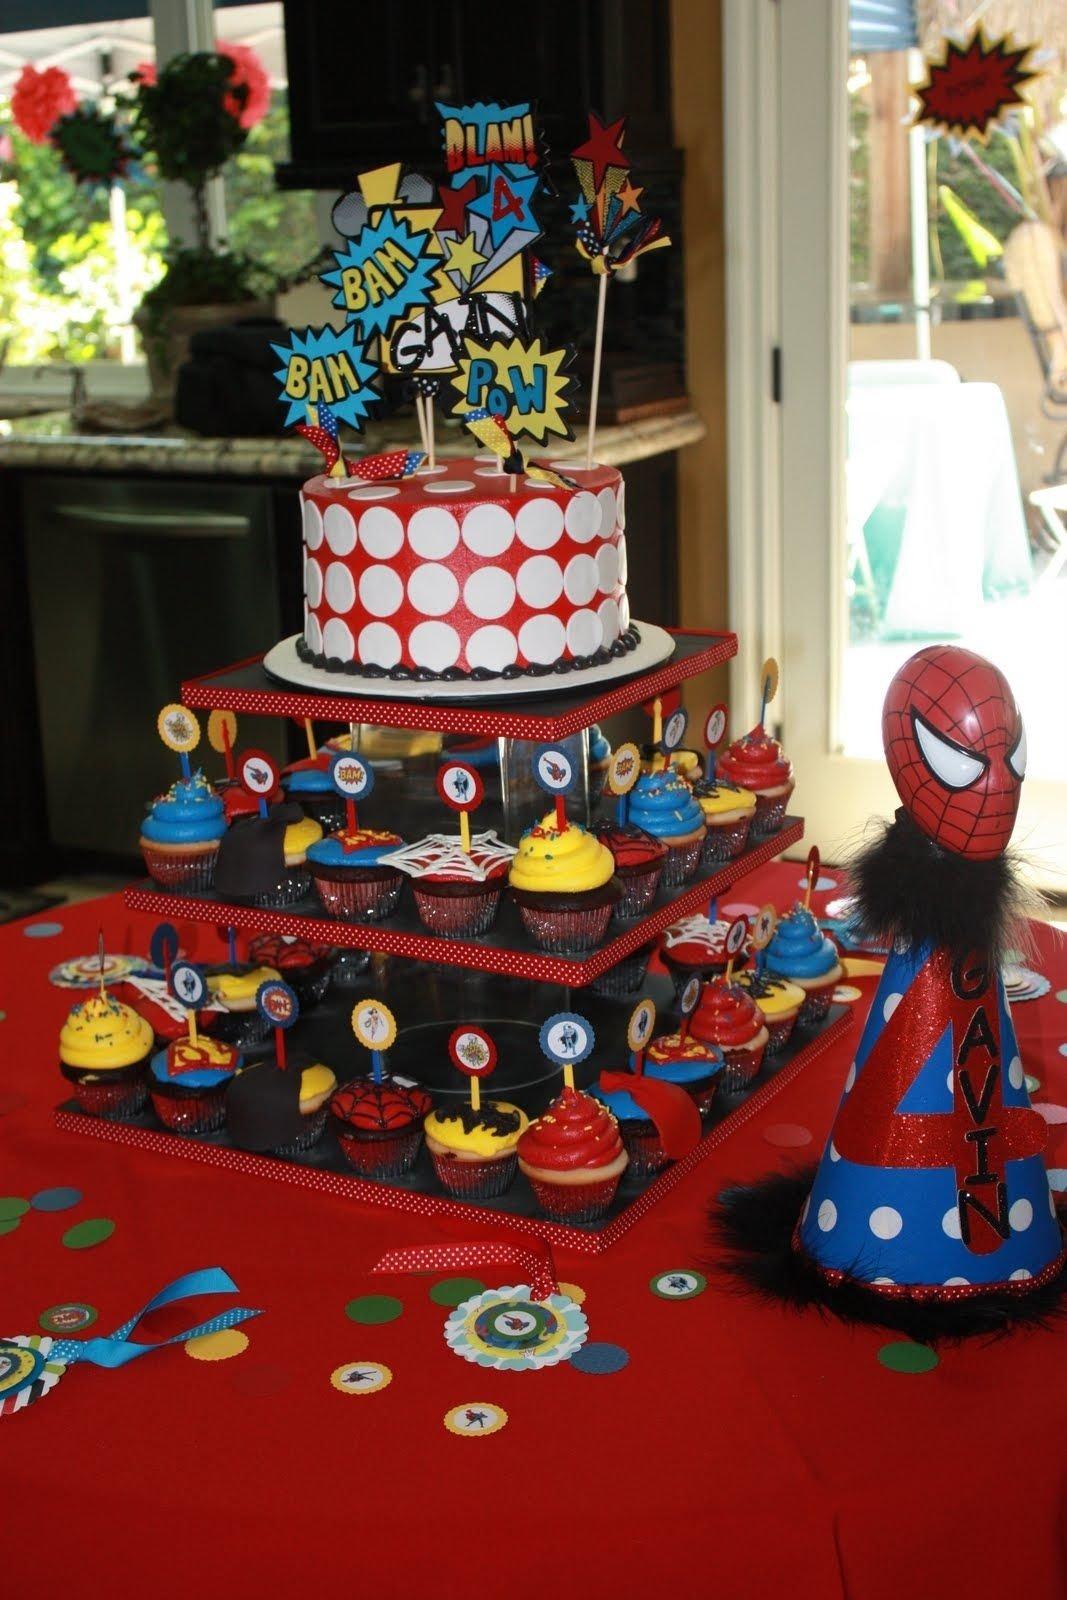 10 Stunning Kids Birthday Party Ideas Pinterest kids party ideas kids birthday party theme decoration for boys 2020